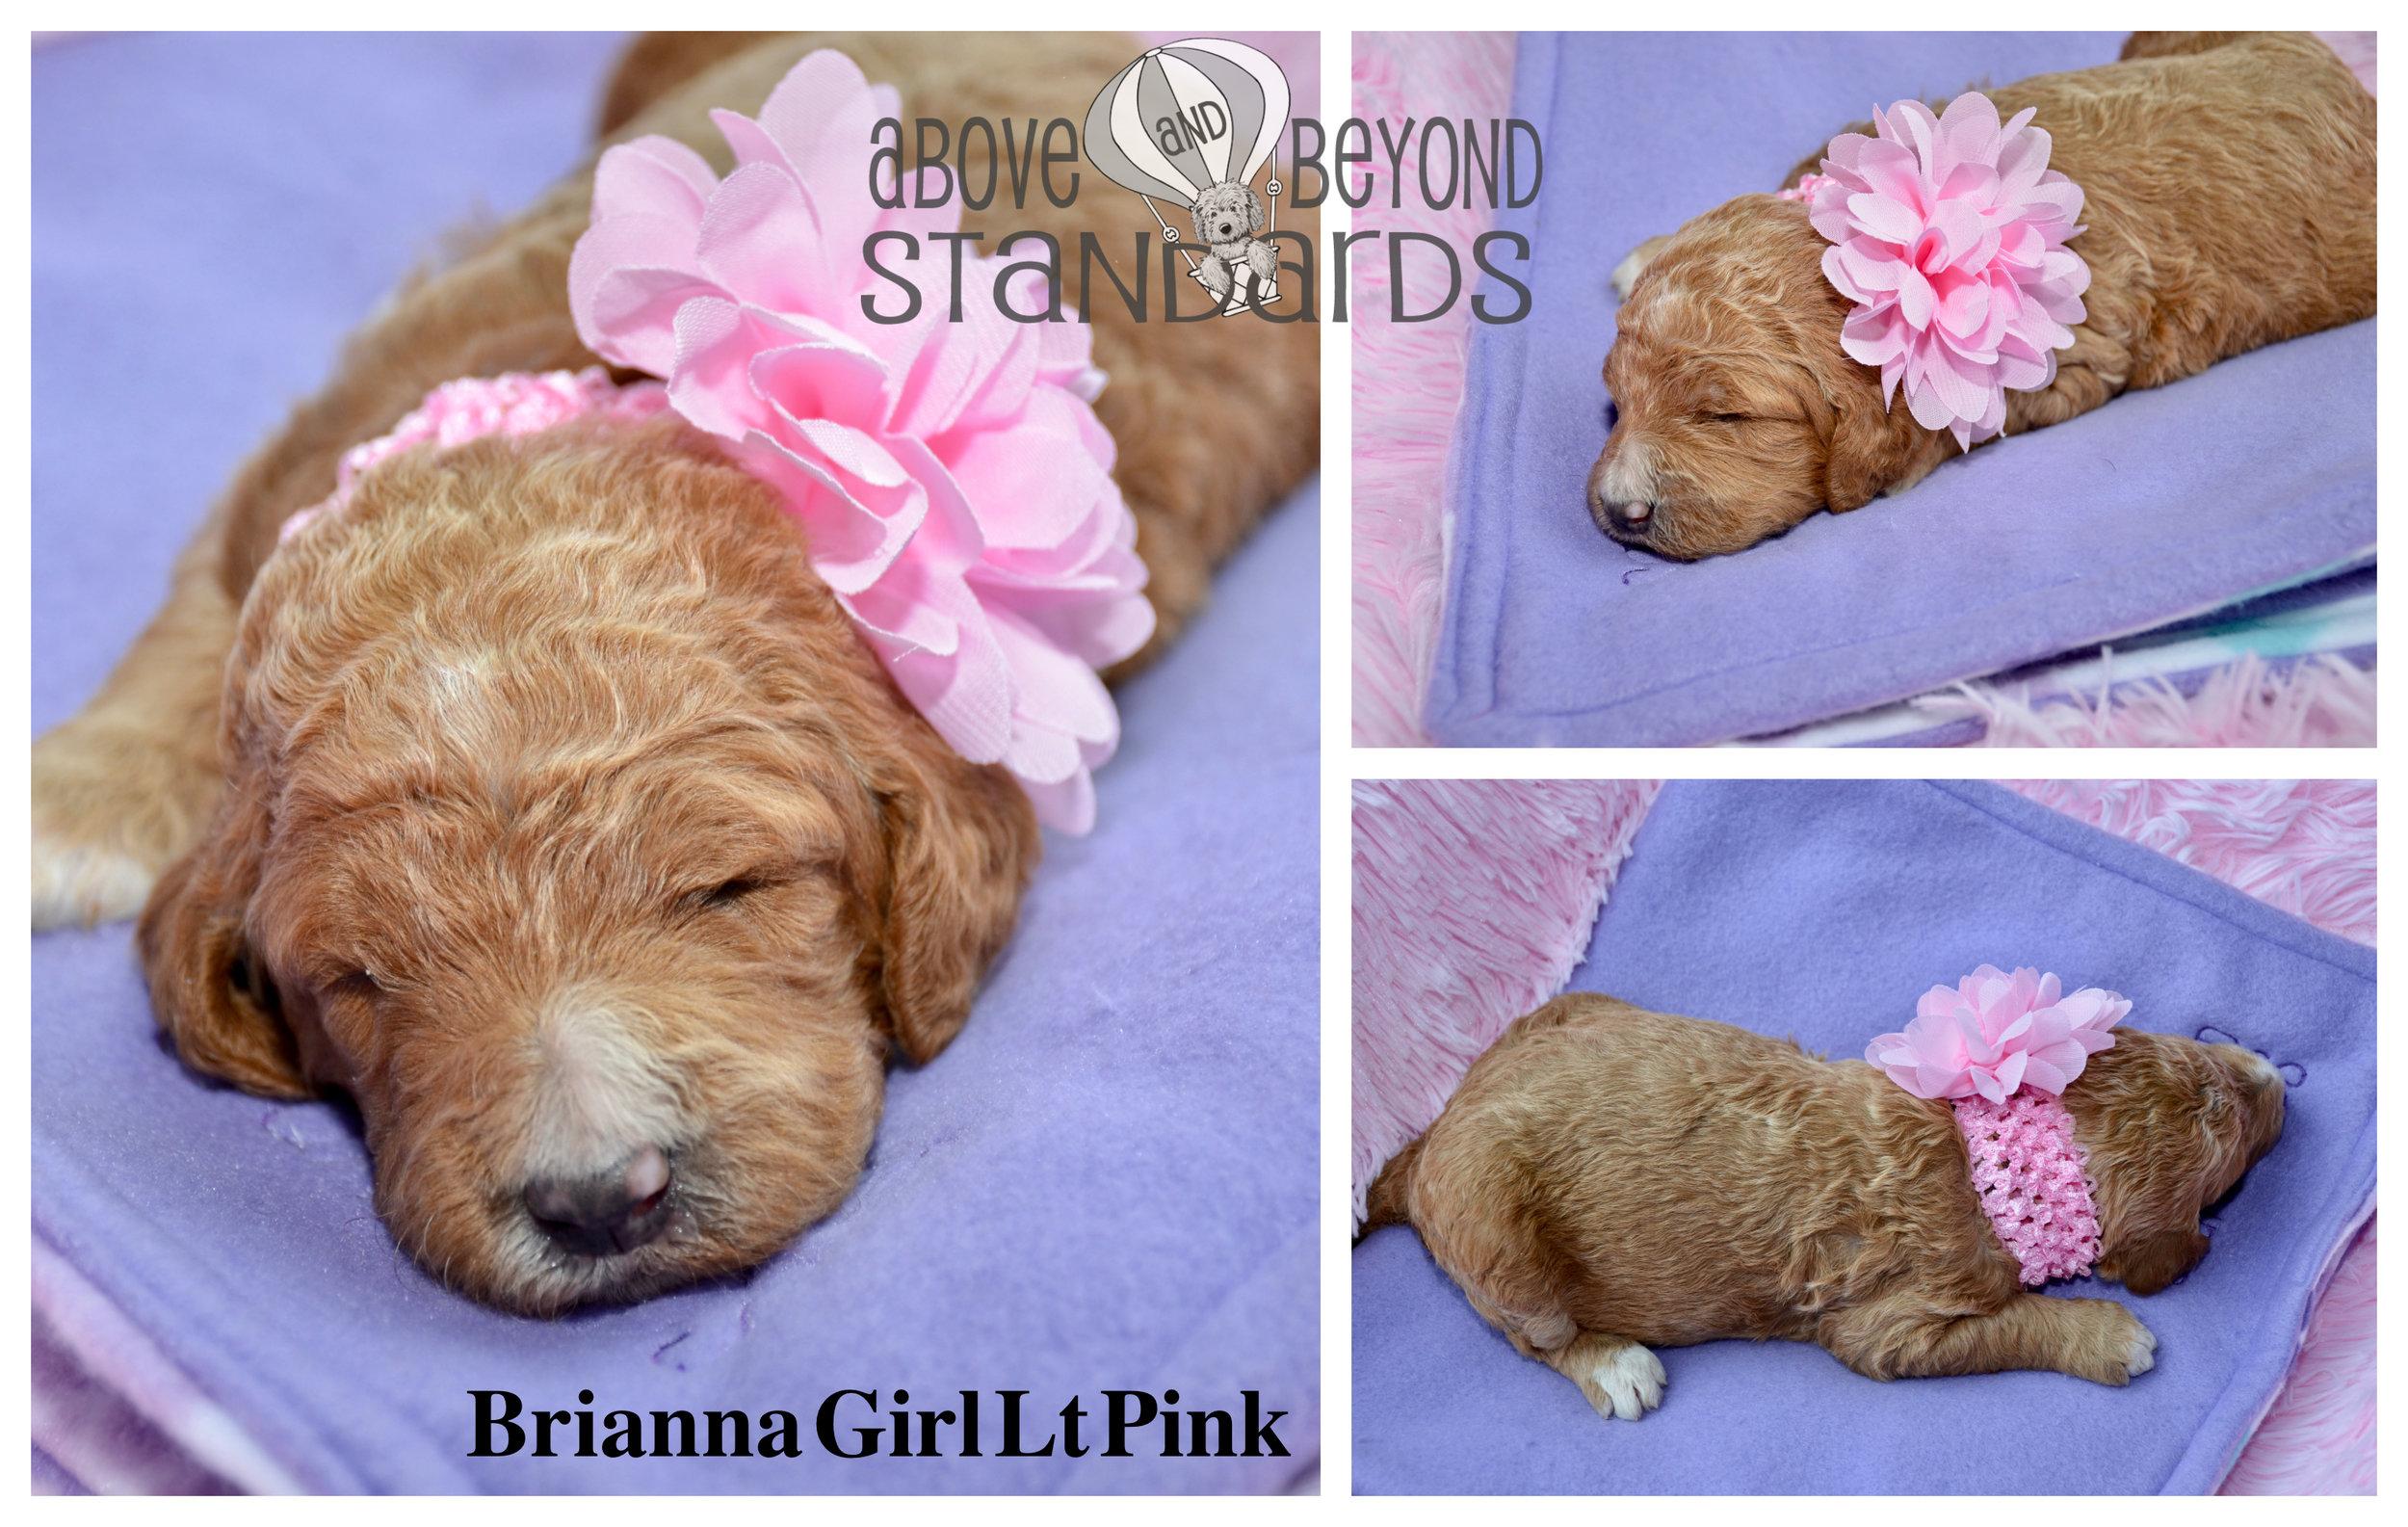 Brianna Girl Lt Pink - EMILIE & CRUSHER STANDARD POODLE FEBRUARY 2ND, 2019.jpg